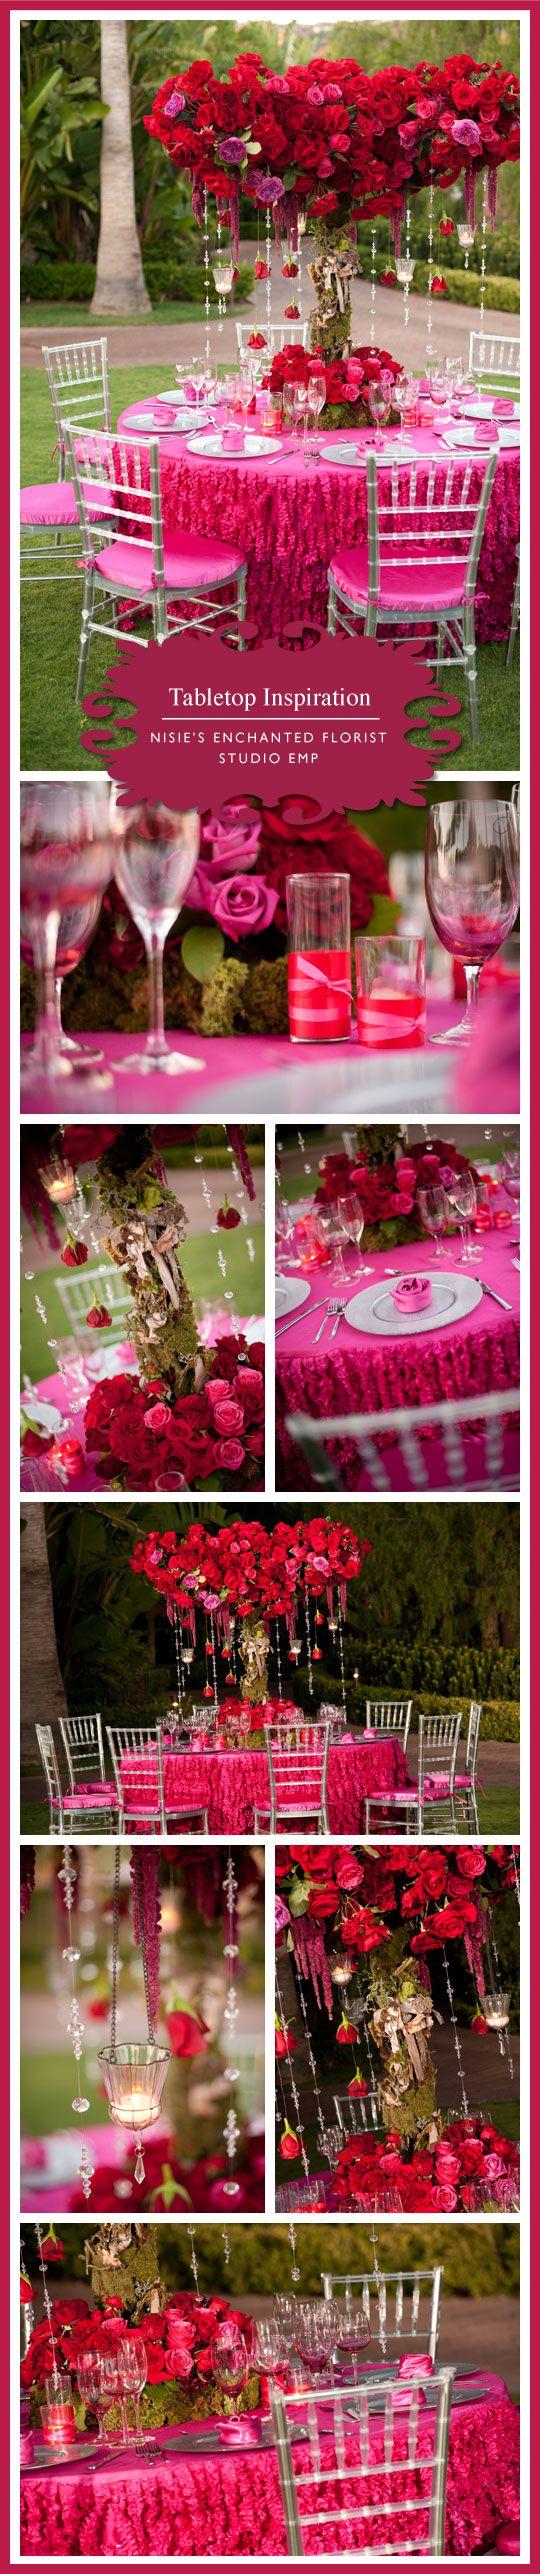 studio_emp_nisie's_enchanted_florist-1